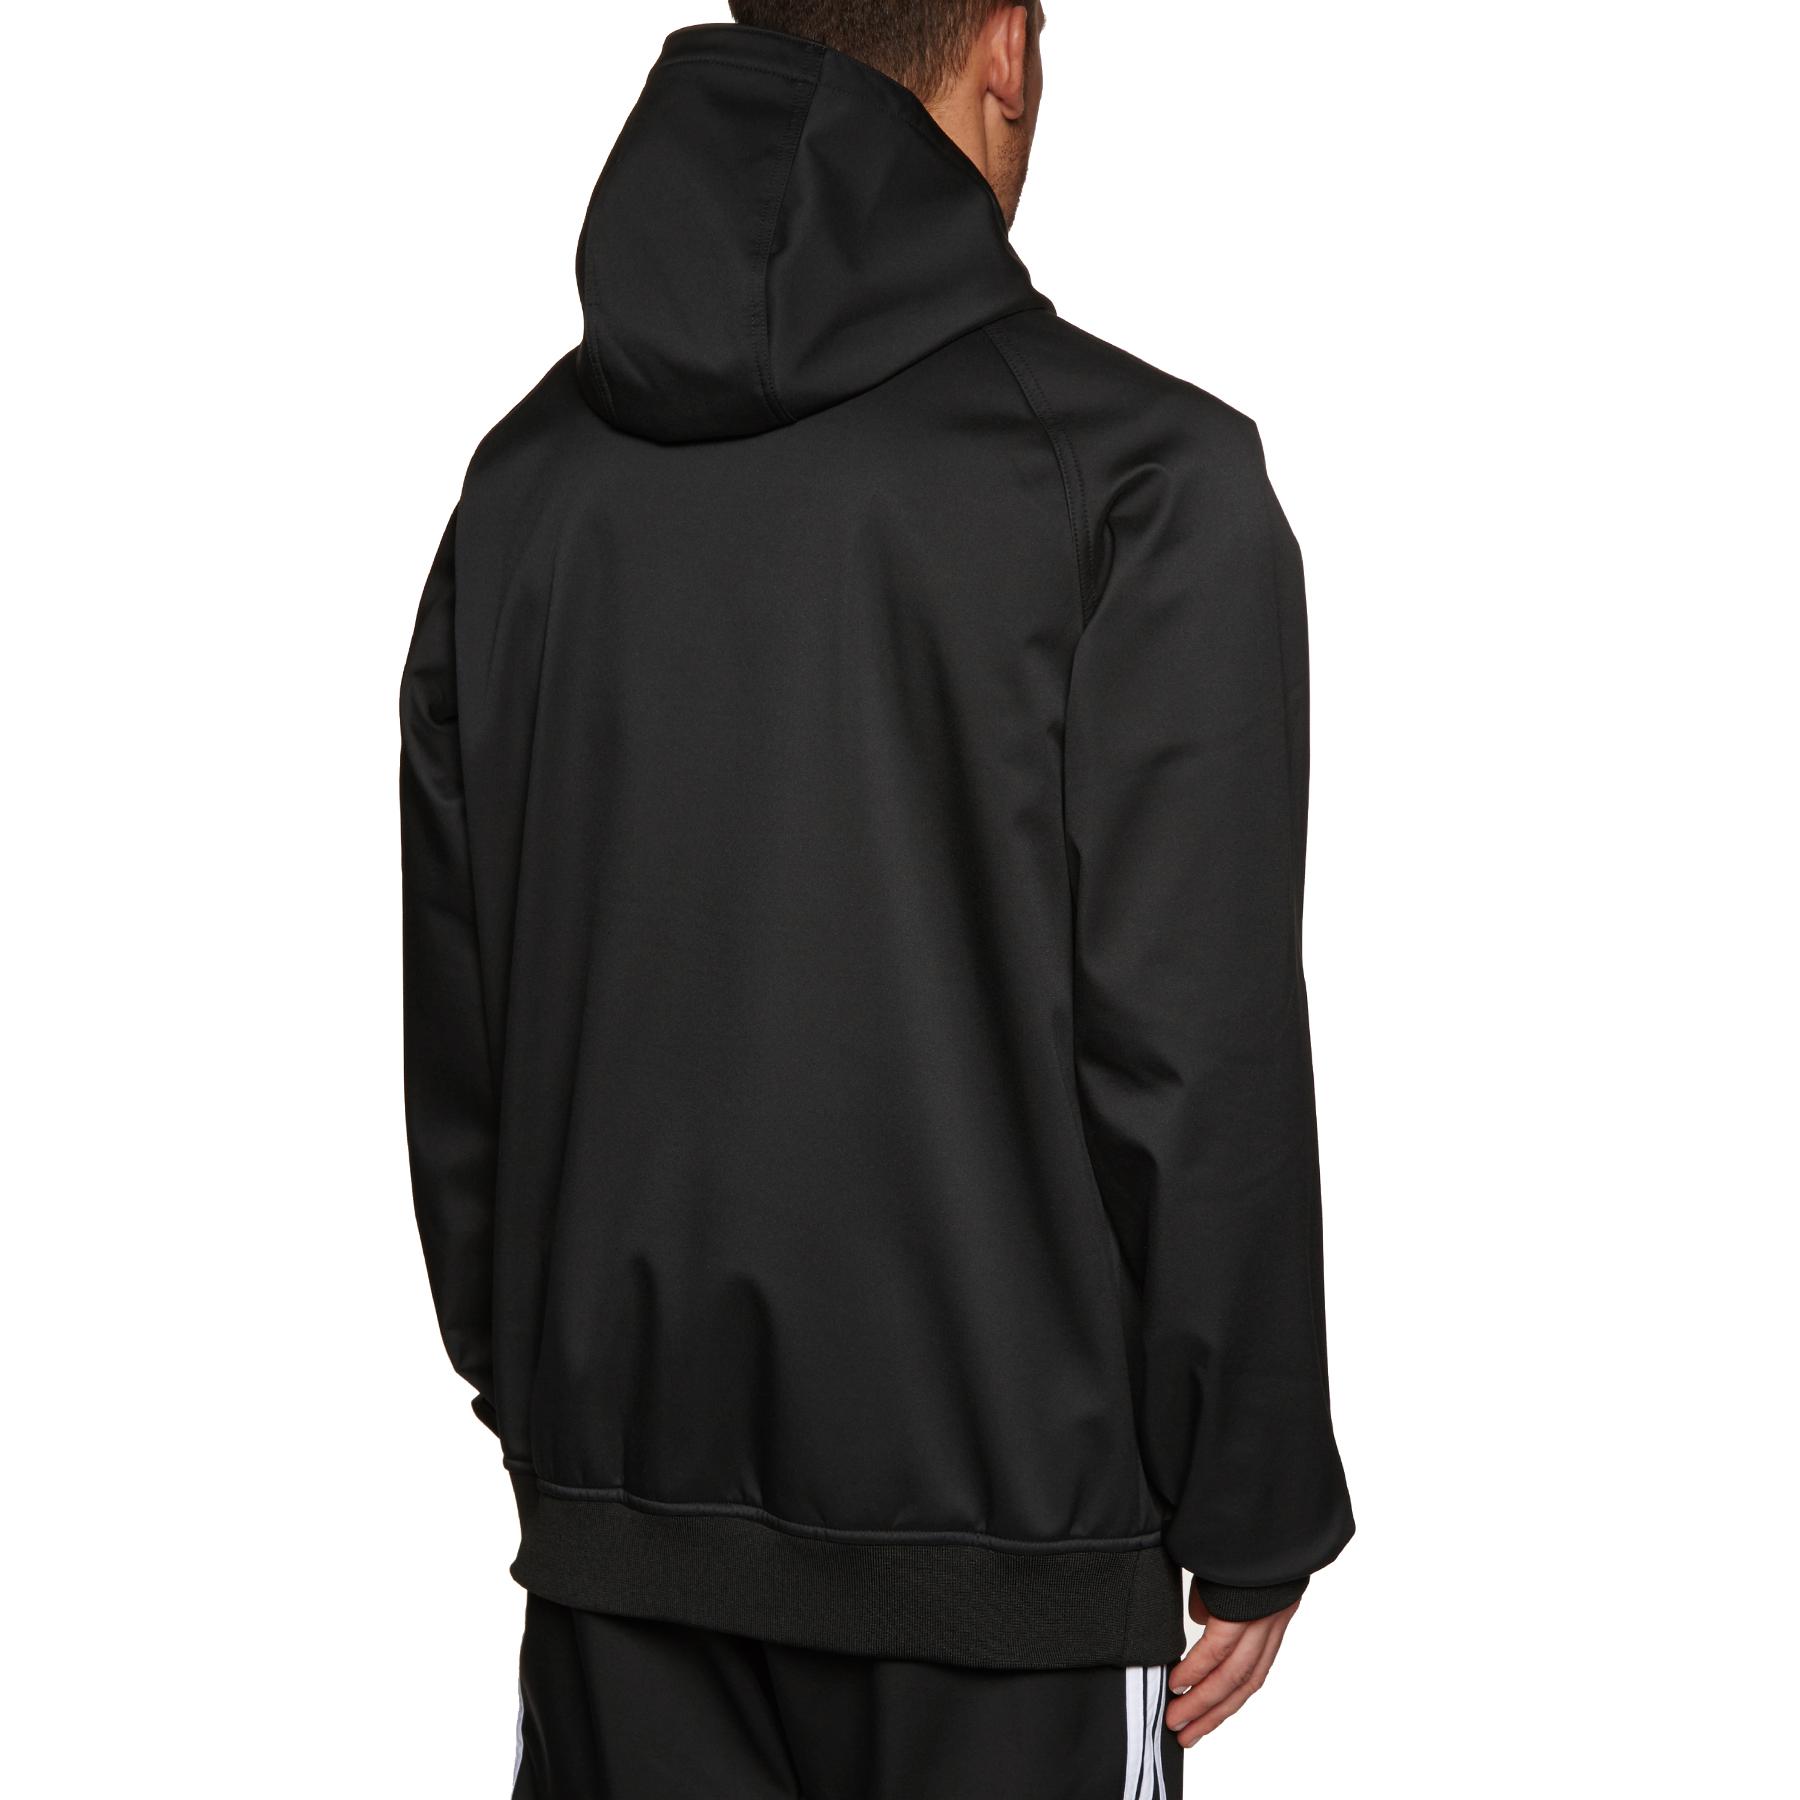 Adidas Greeley Softshell SkiSnowboard Jacket, S Black White